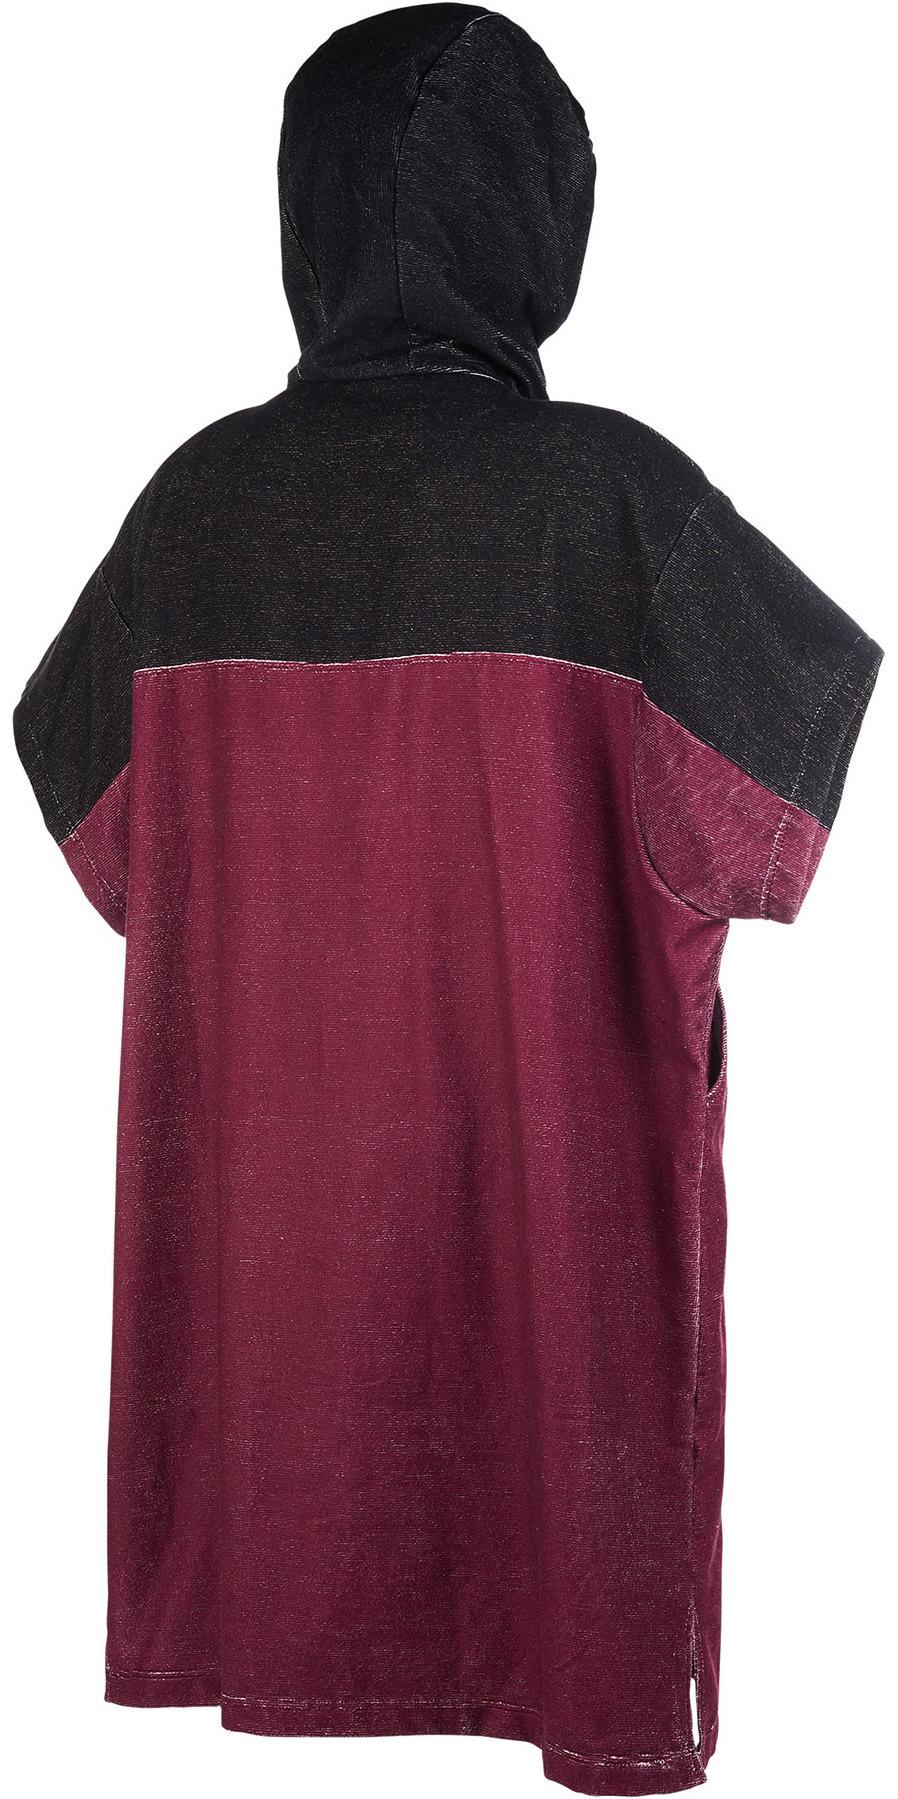 2019 Mystic Regular Poncho / Change Robe Dark Red 190169